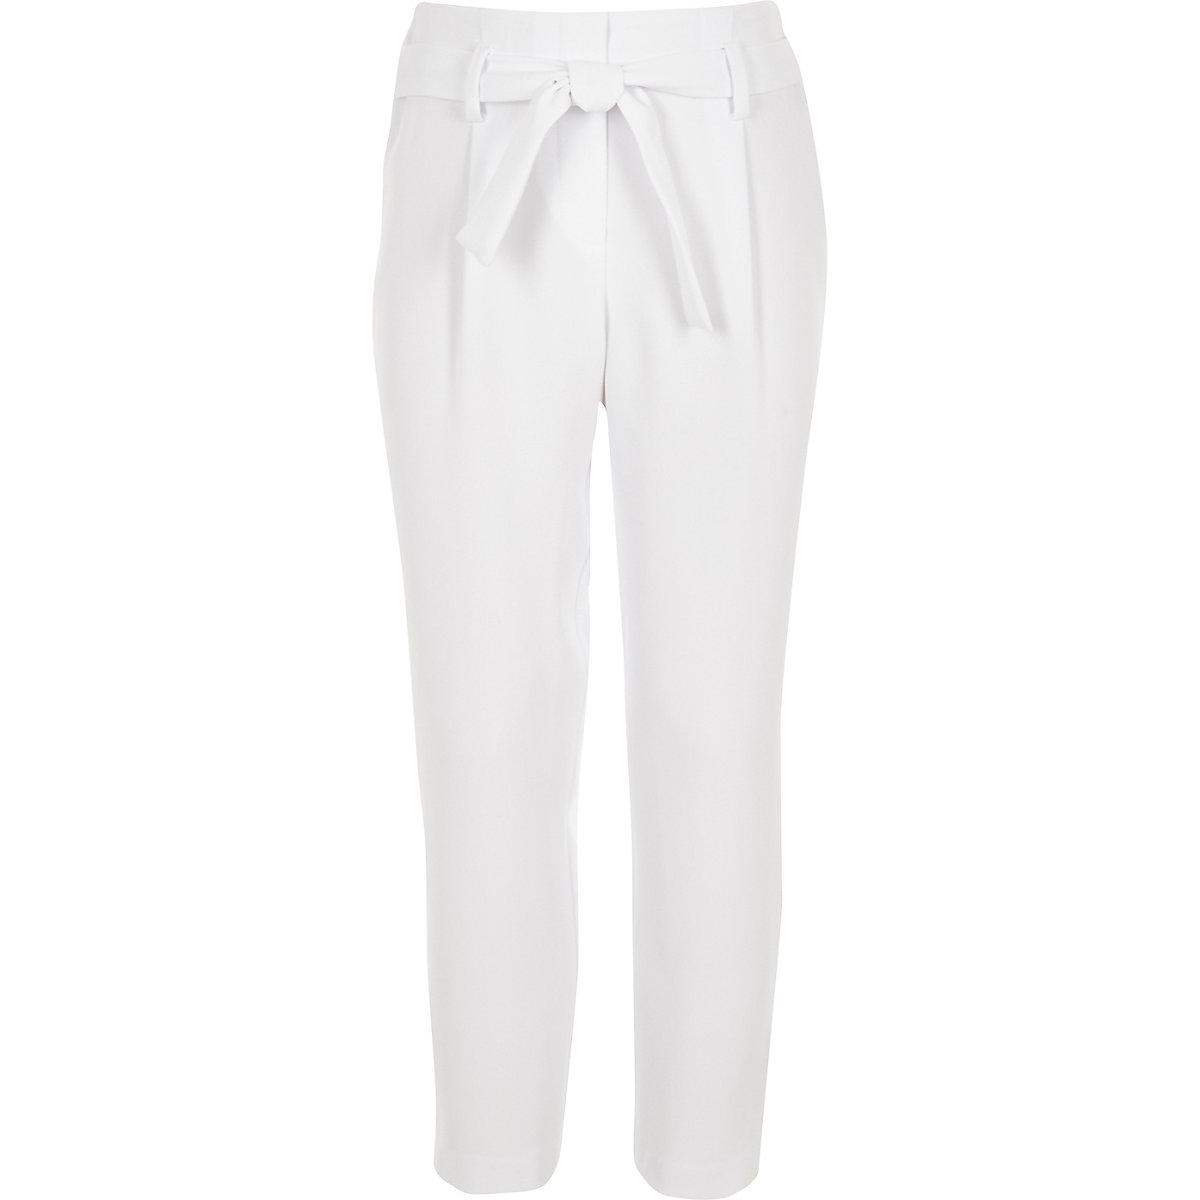 Girls white tapered tie waist trousers